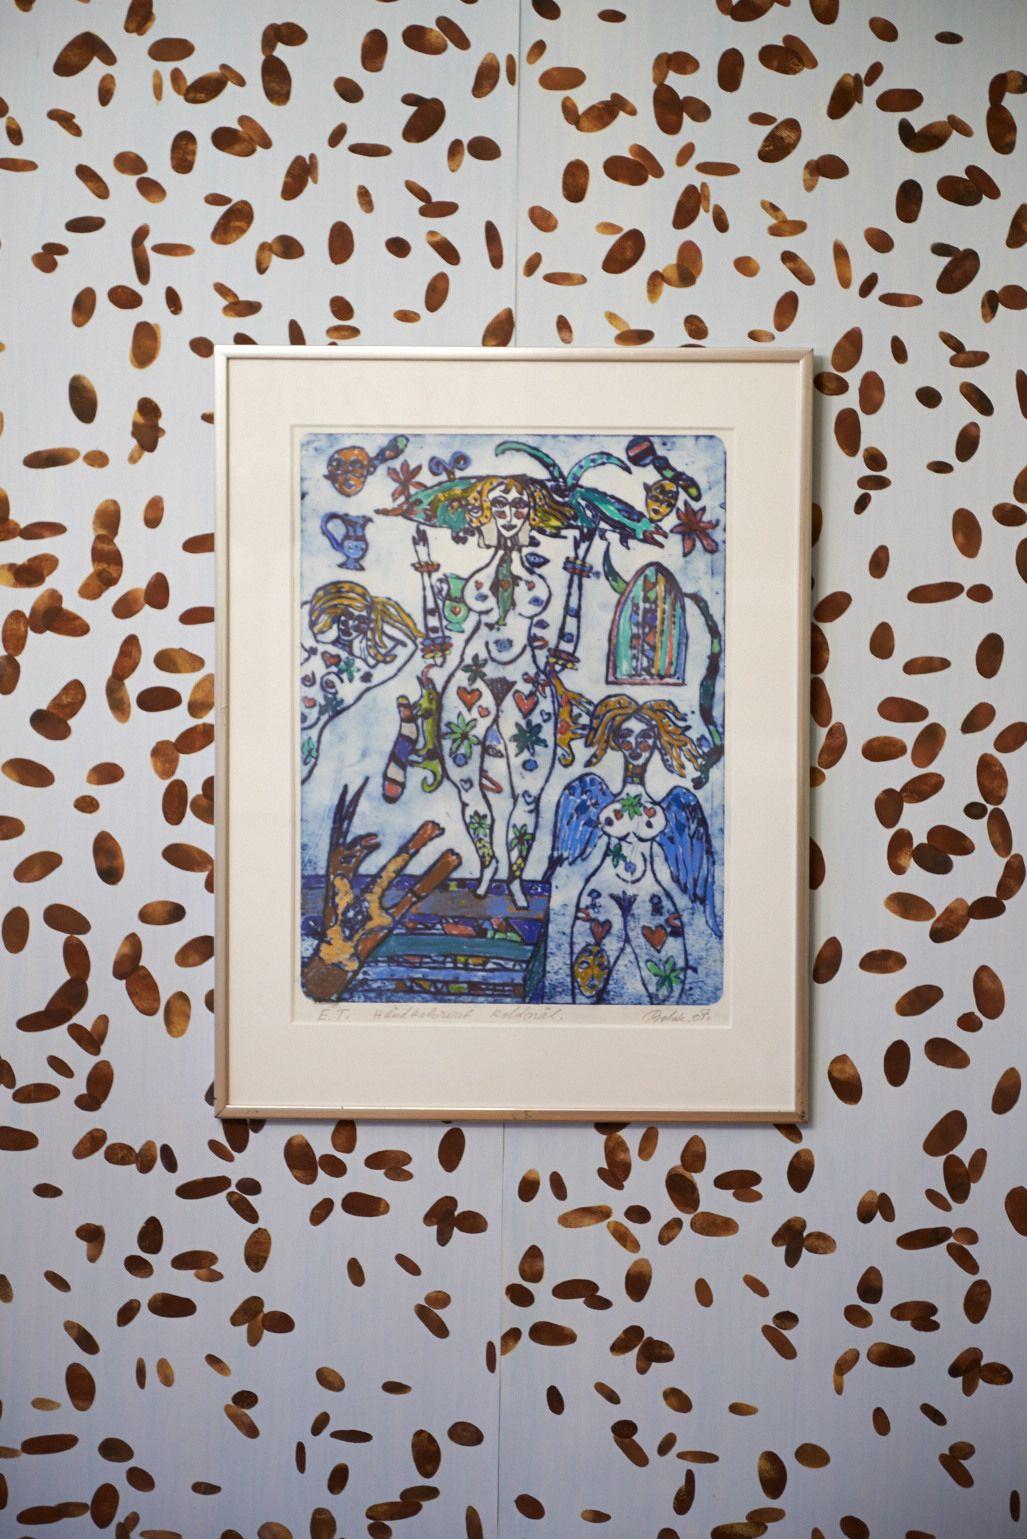 Kunst på tapetet.  Håndtrykt LLZ TAPET CACAOBØNNE Fra udstillingen i Galleri5000 2014